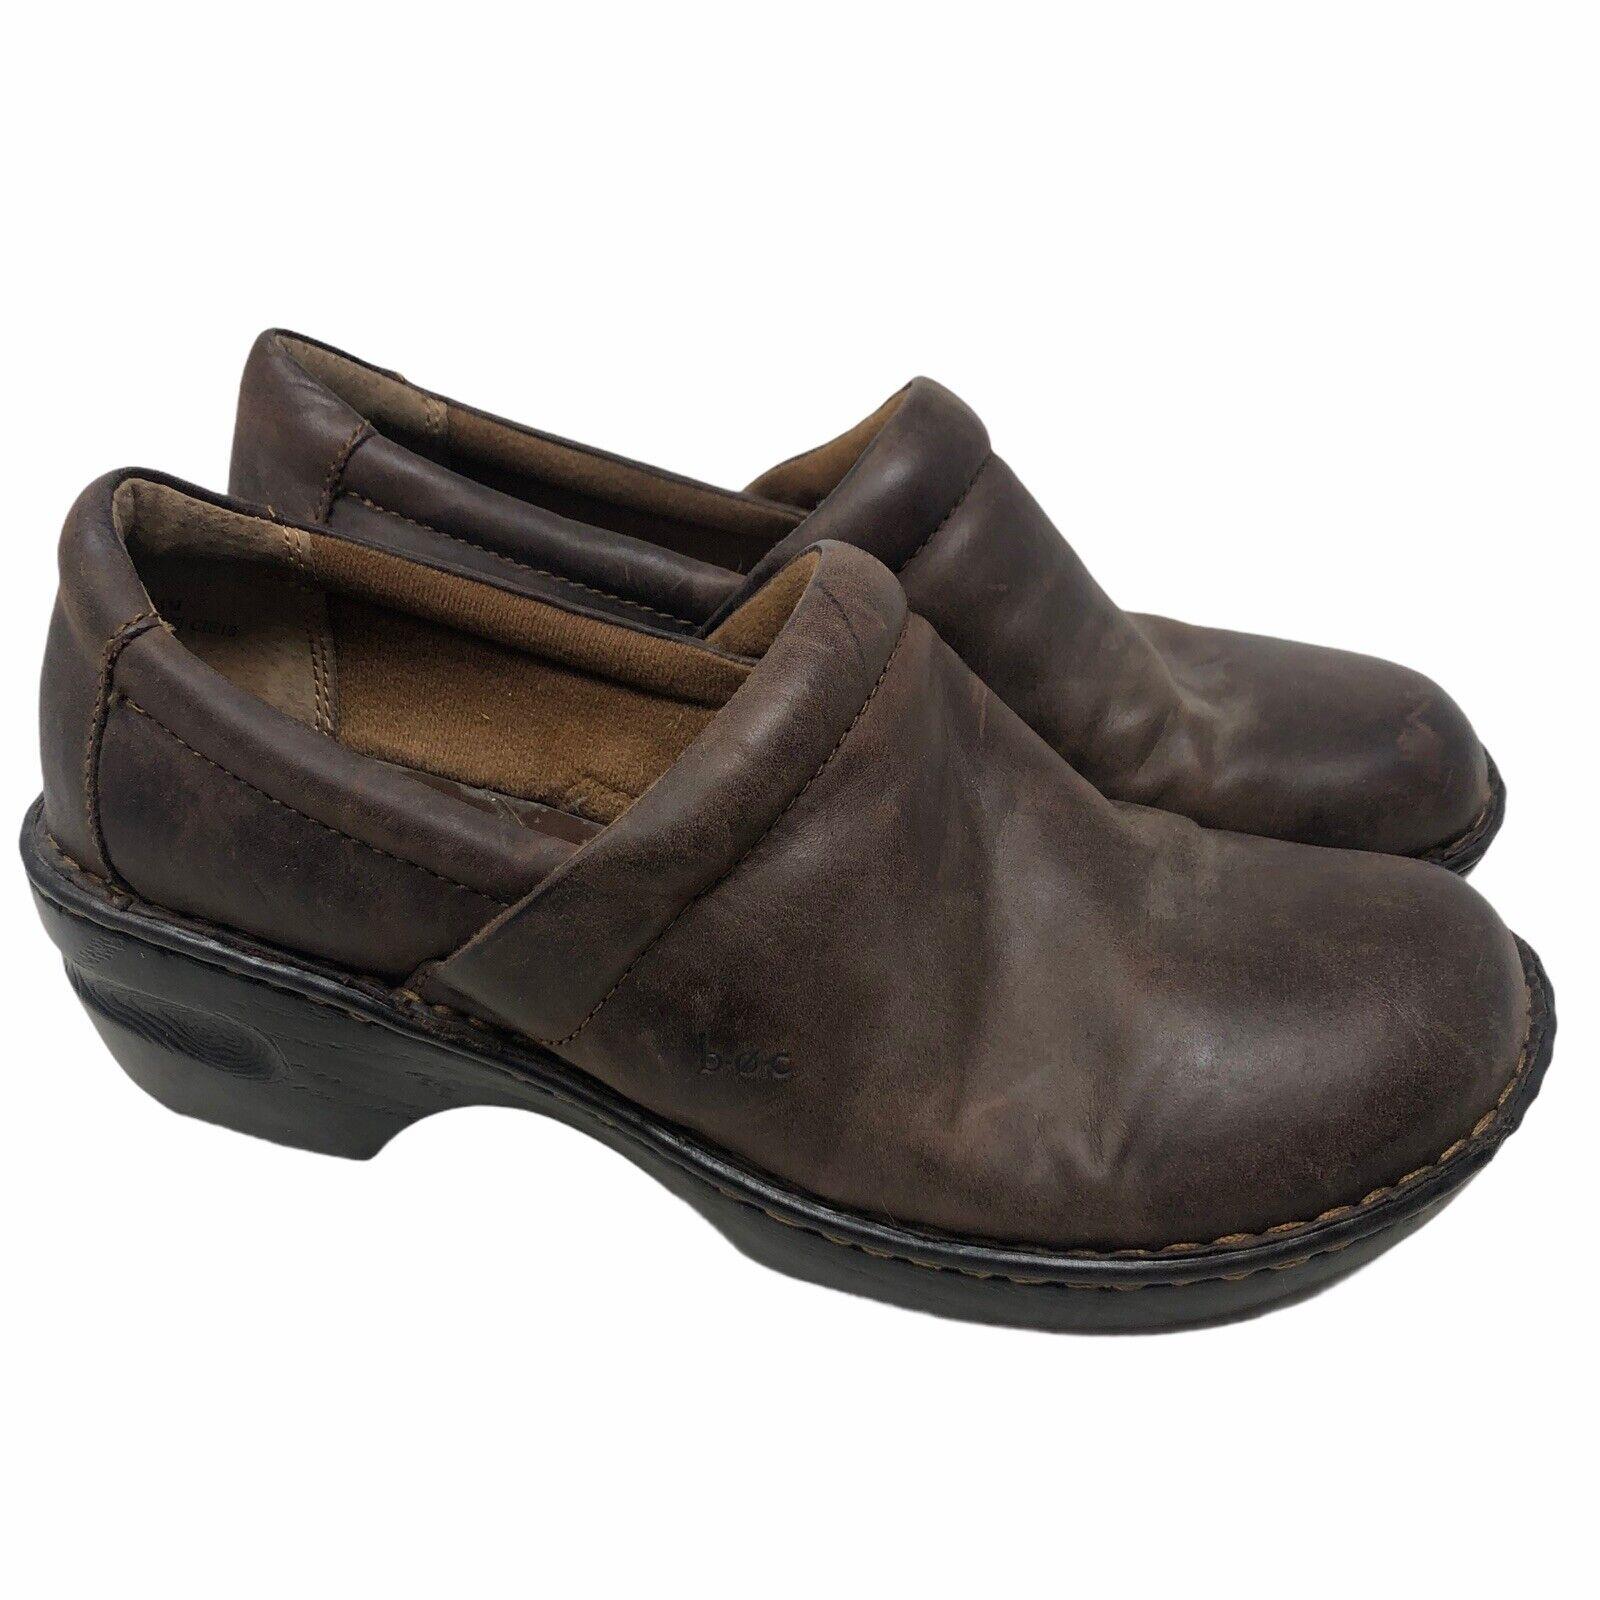 BOC Born Concepts Women's Brown Leather Slip On Clogs Mule Shoes US Size 11